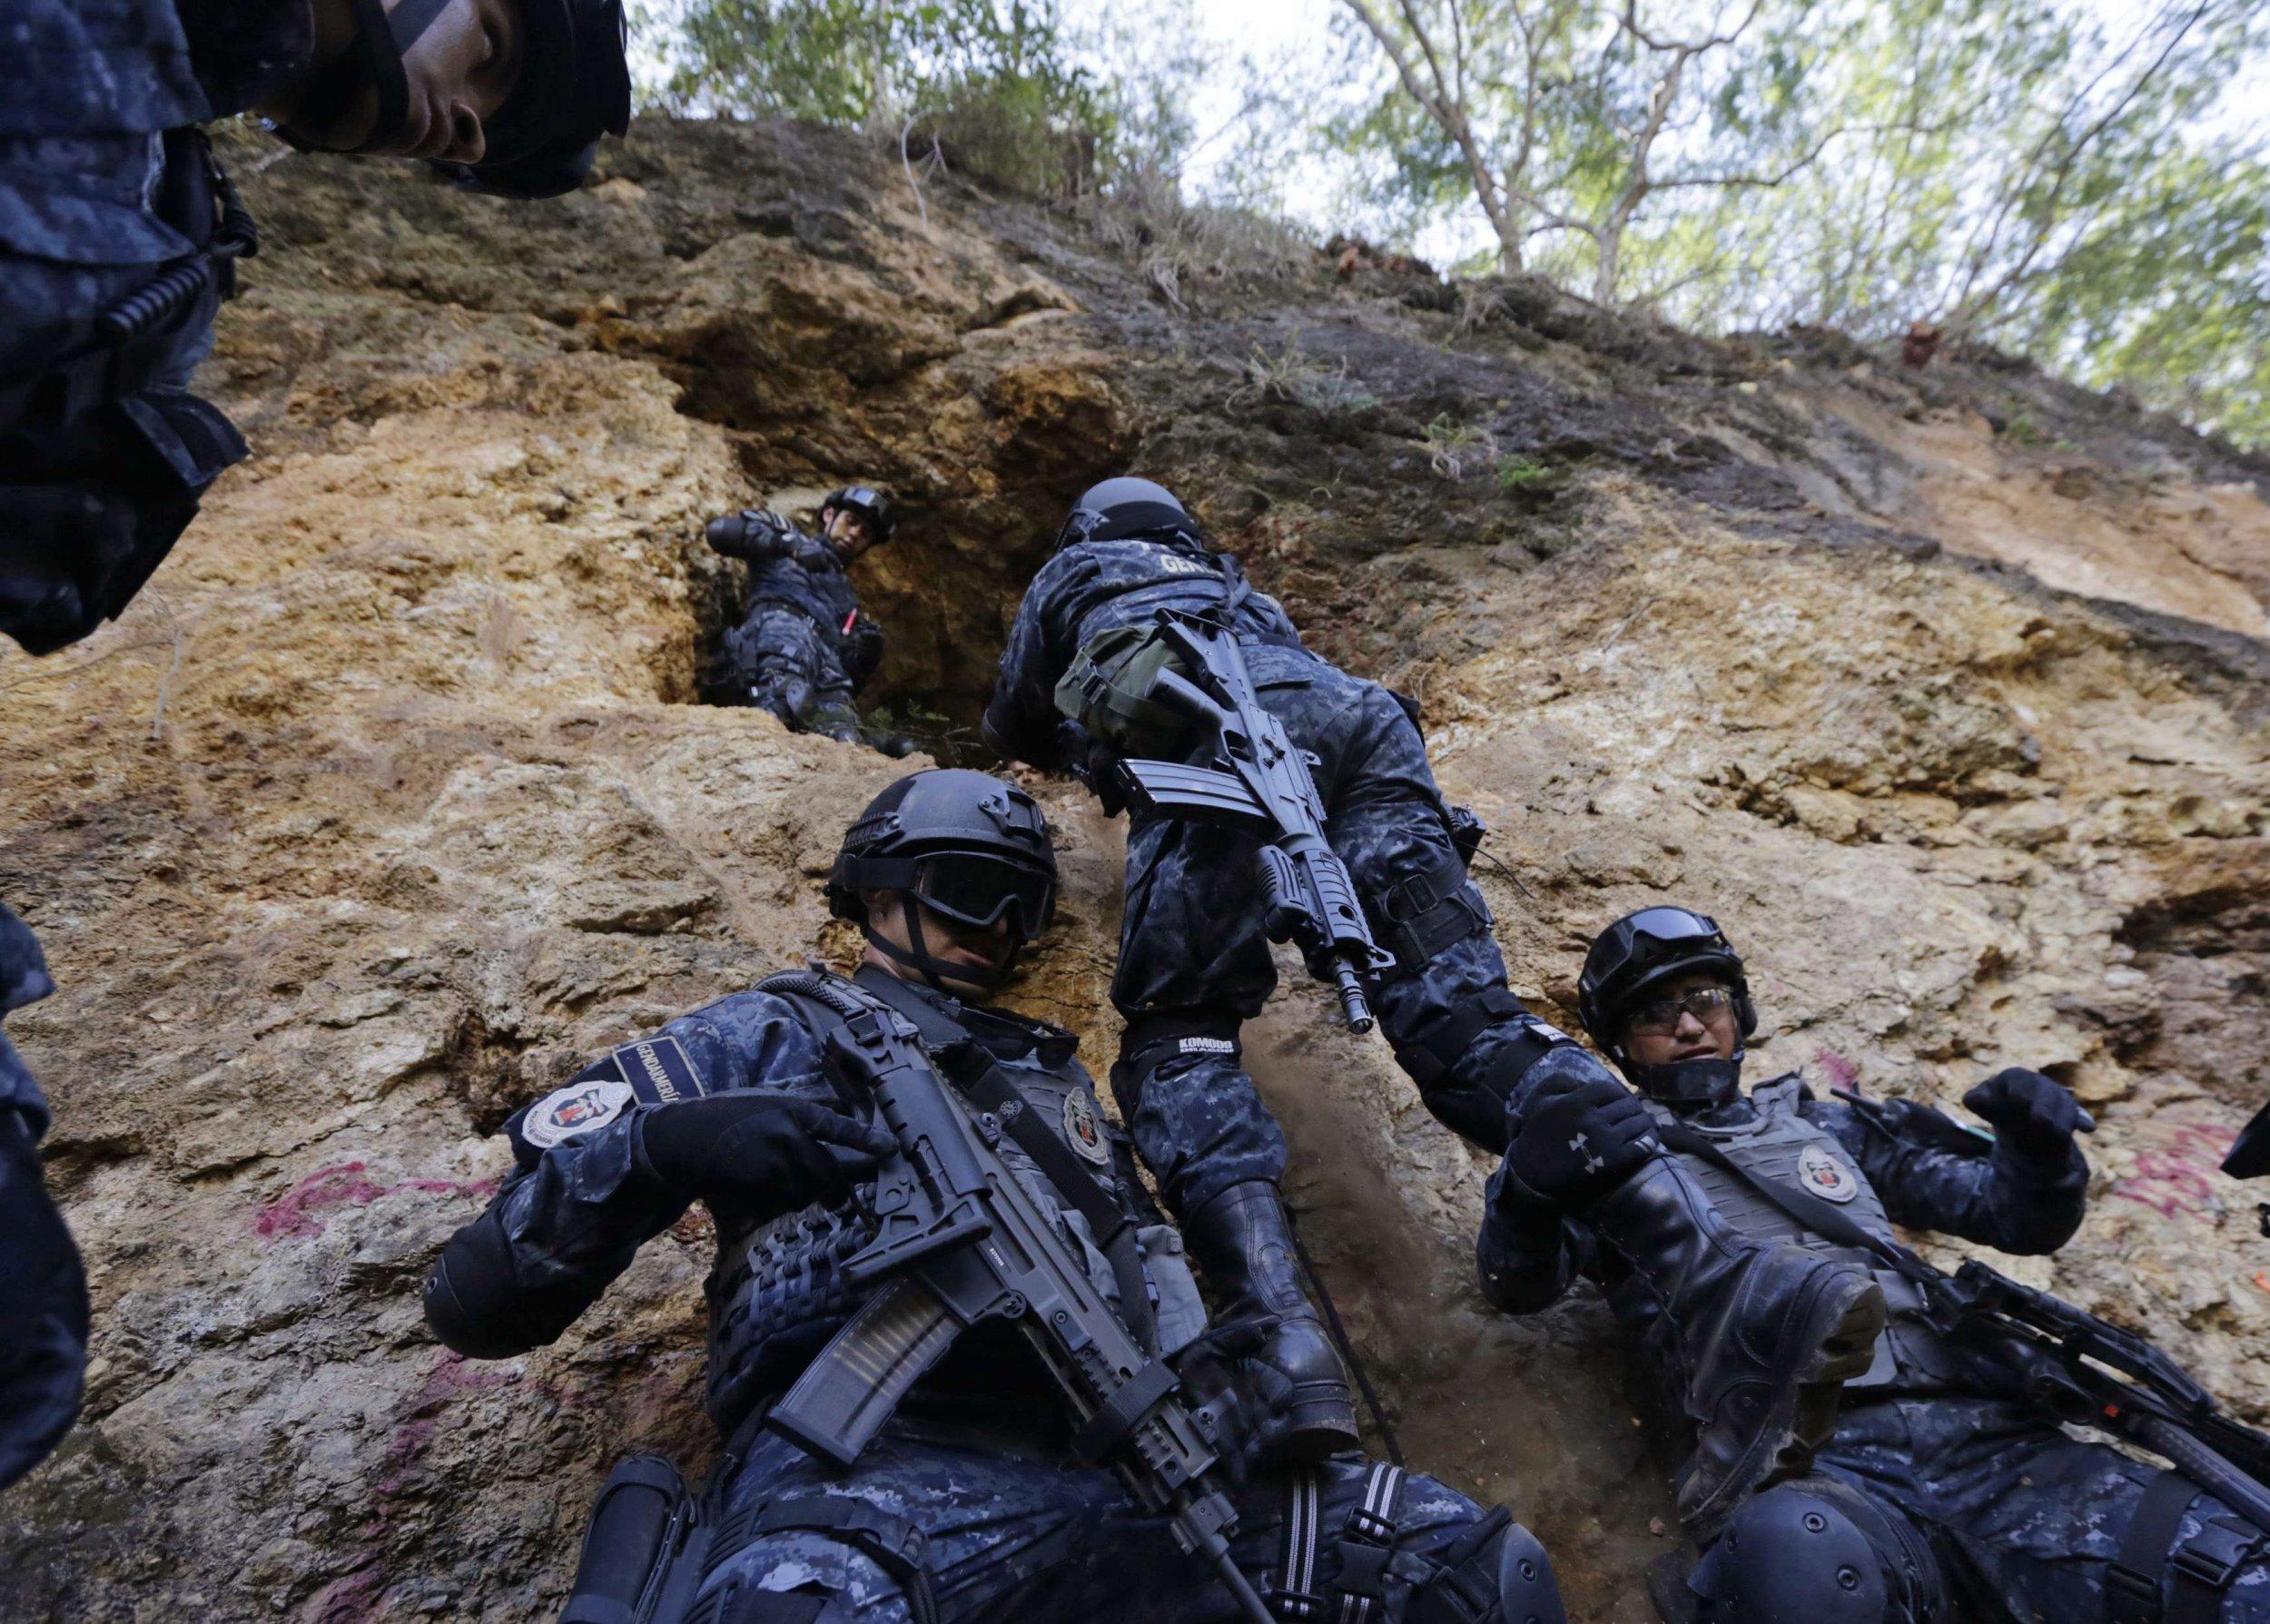 2014-11-14T142219Z_1_LYNXNPEAAD0Q4_RTROPTP_4_MEXICO-VIOLENCE